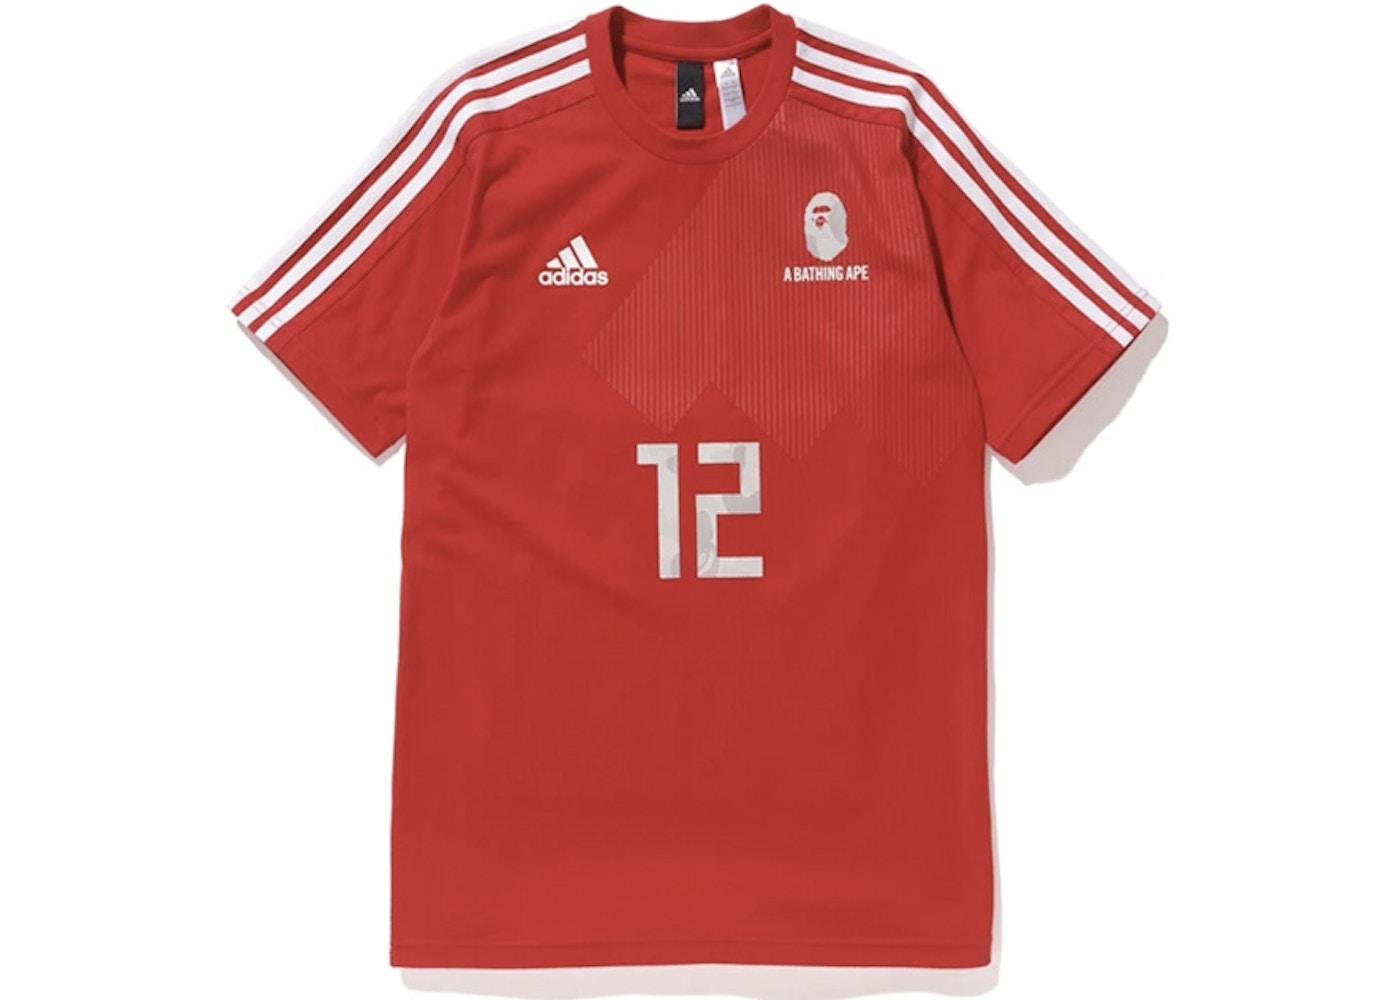 d4cd9c3e3 BAPE x adidas World Cup 2018 Winning Collection Football Top Red